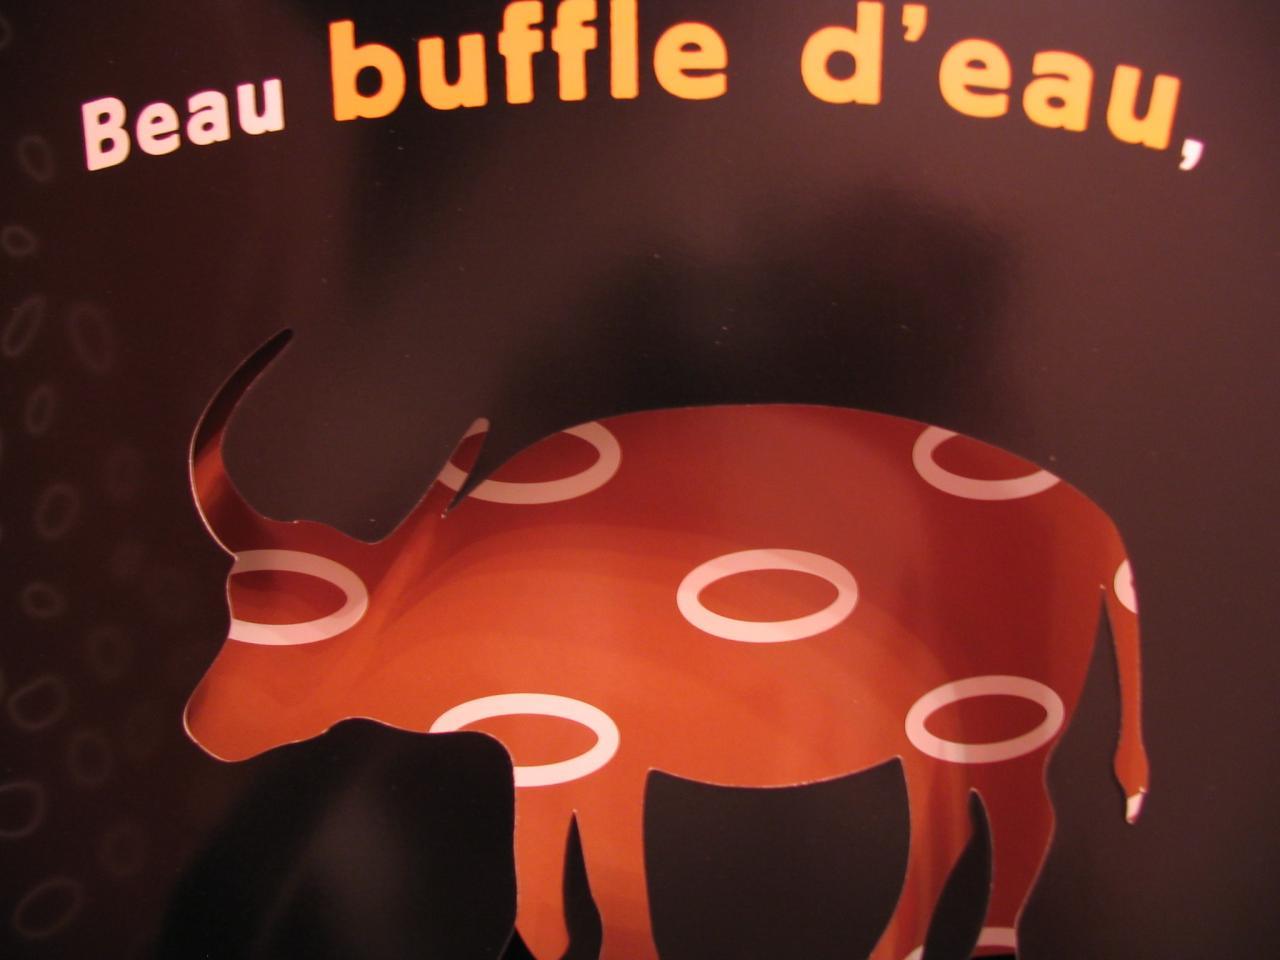 buffle 4